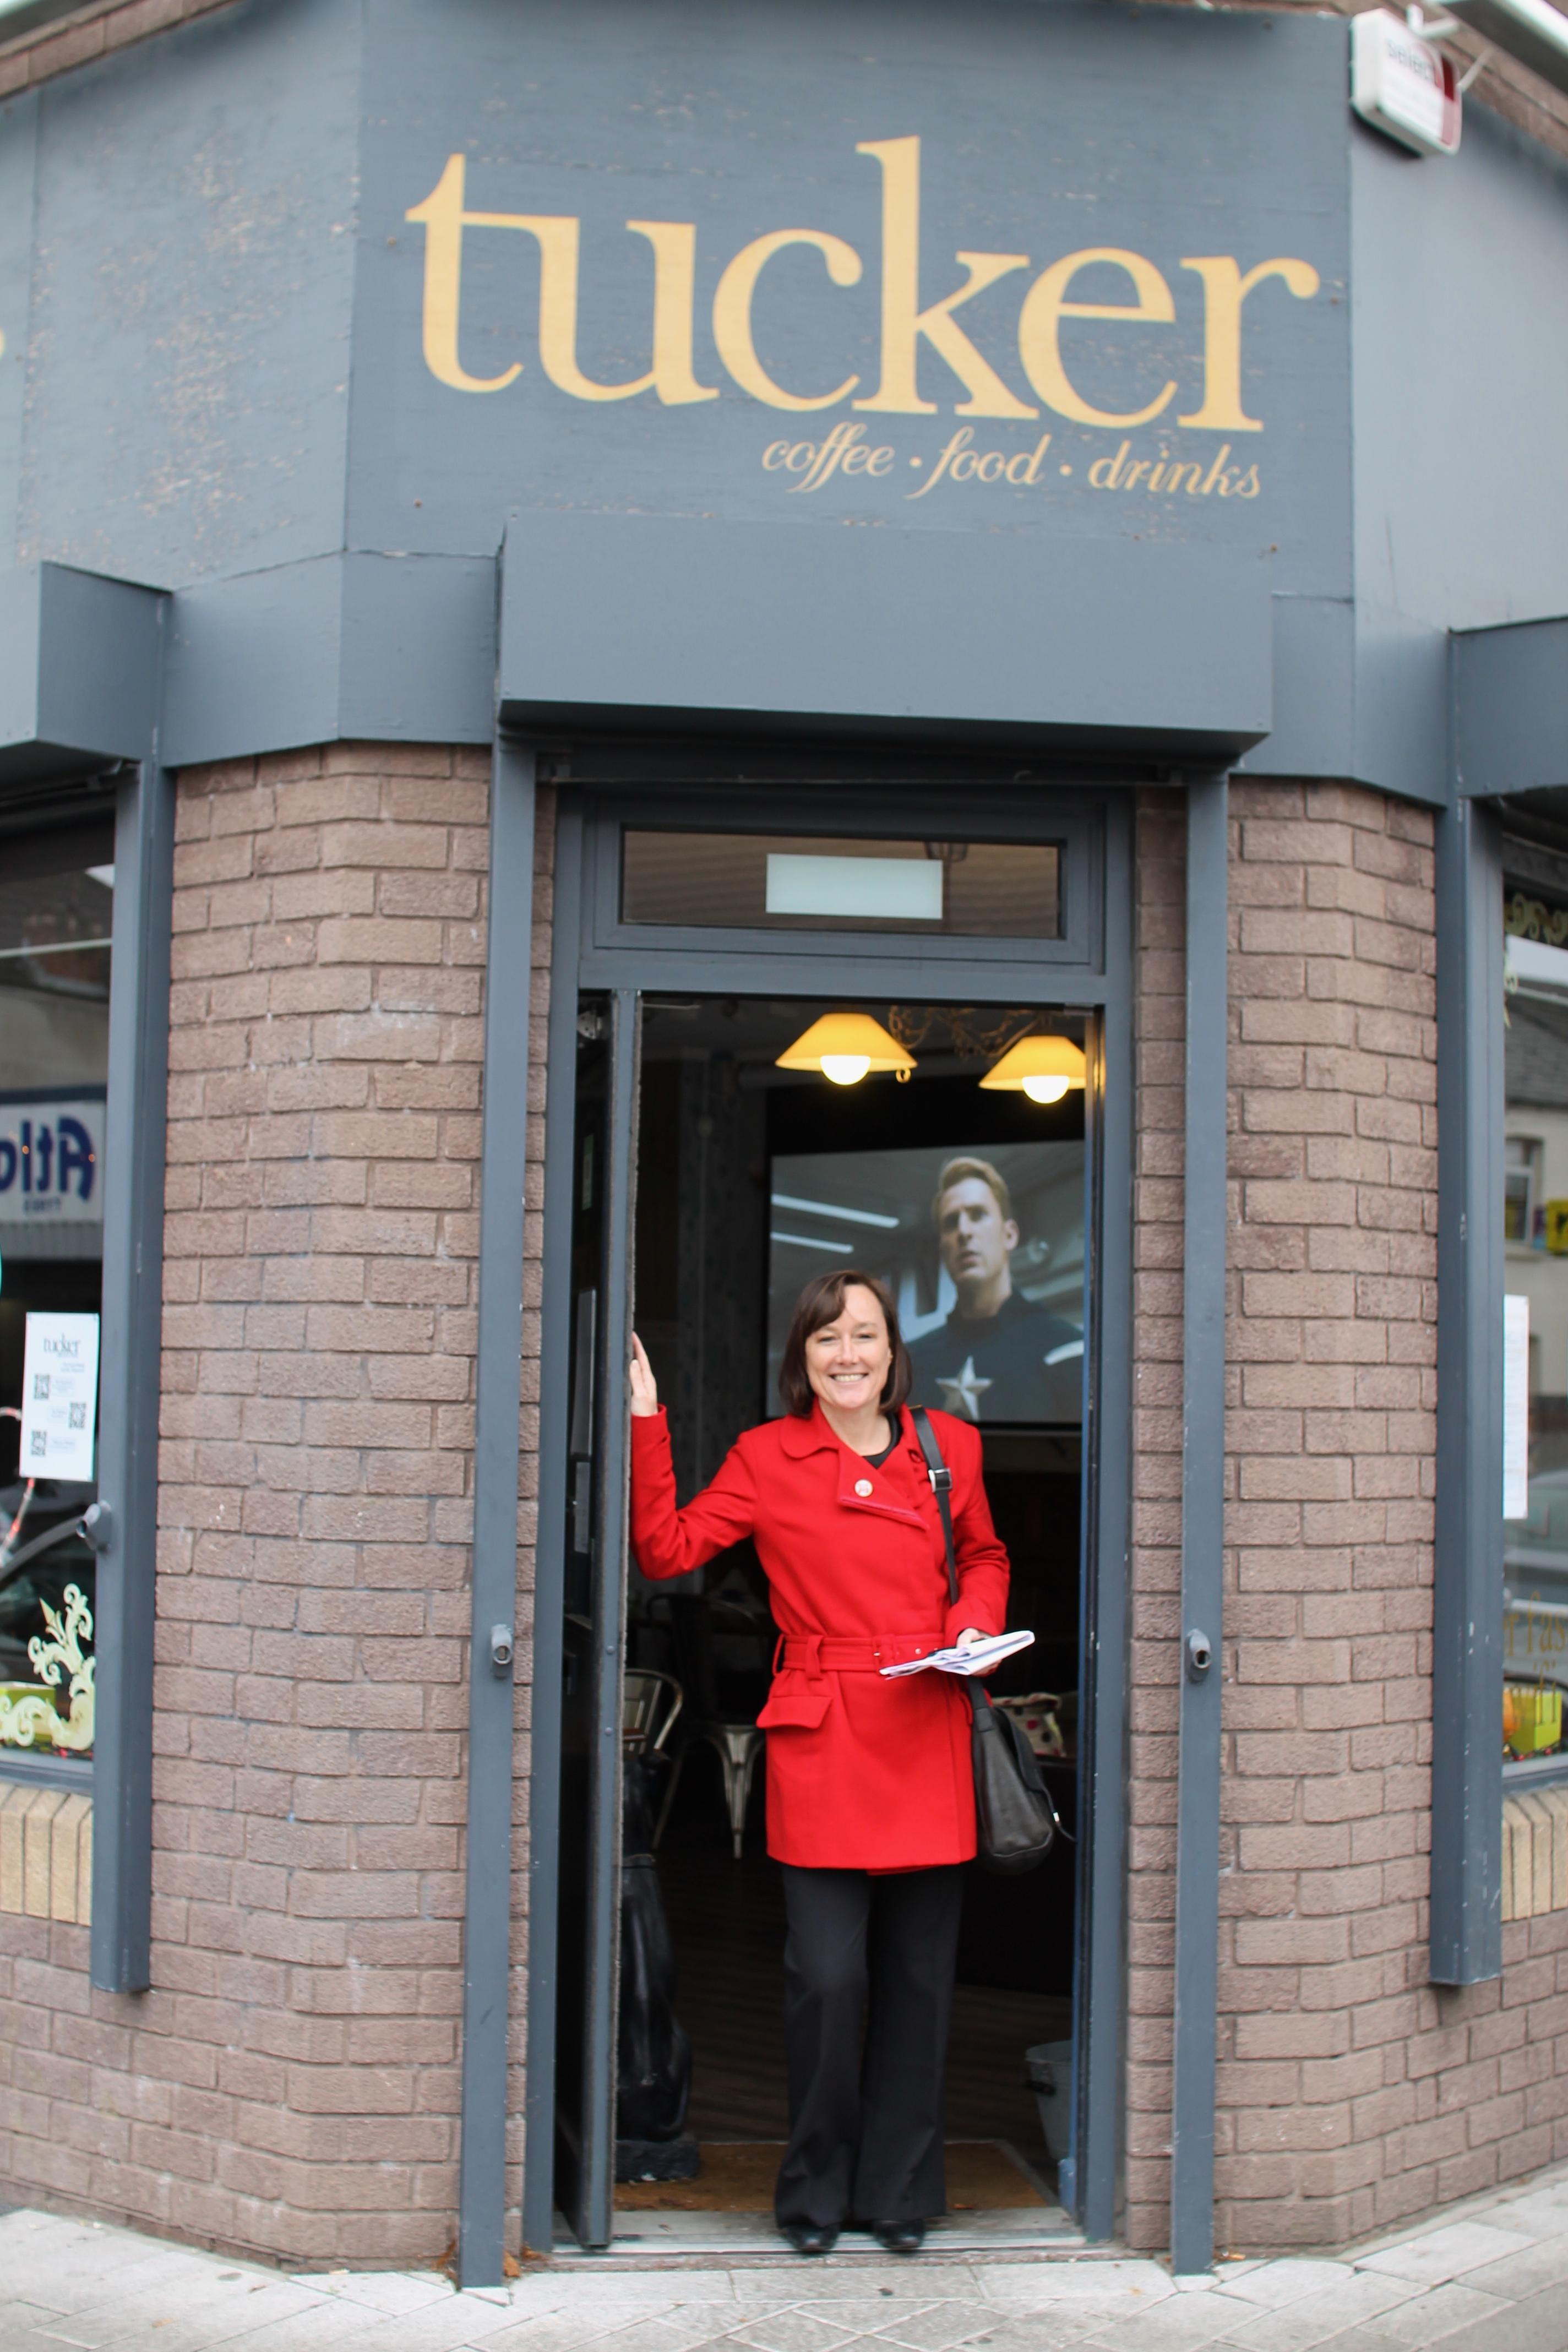 Jo at Tucker Coffee